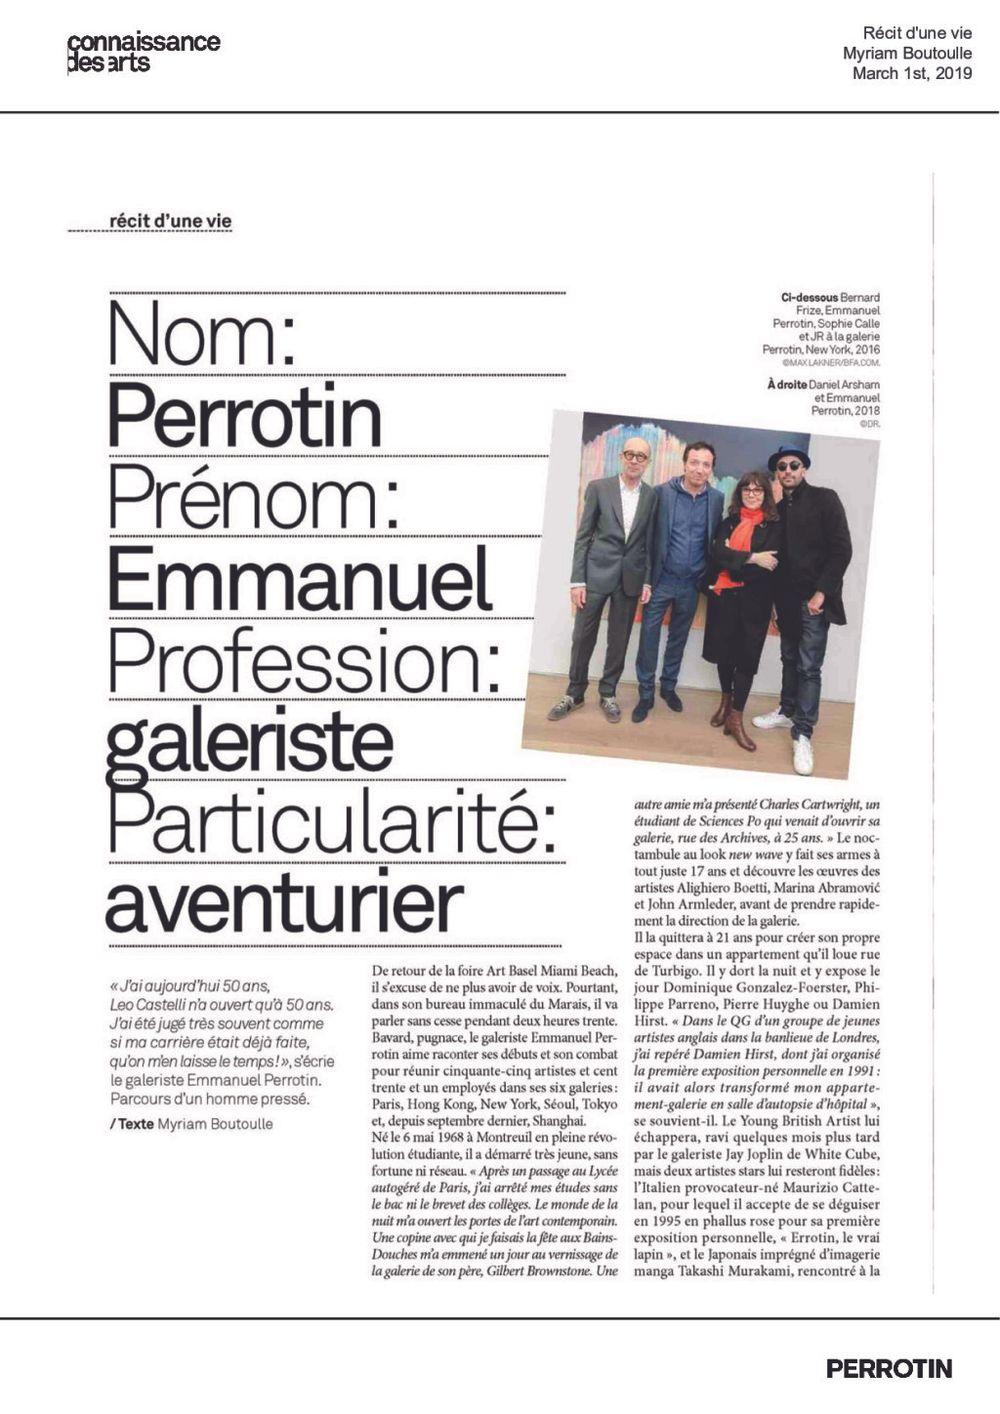 Connaissance des Arts | Emmanuel Perrotin